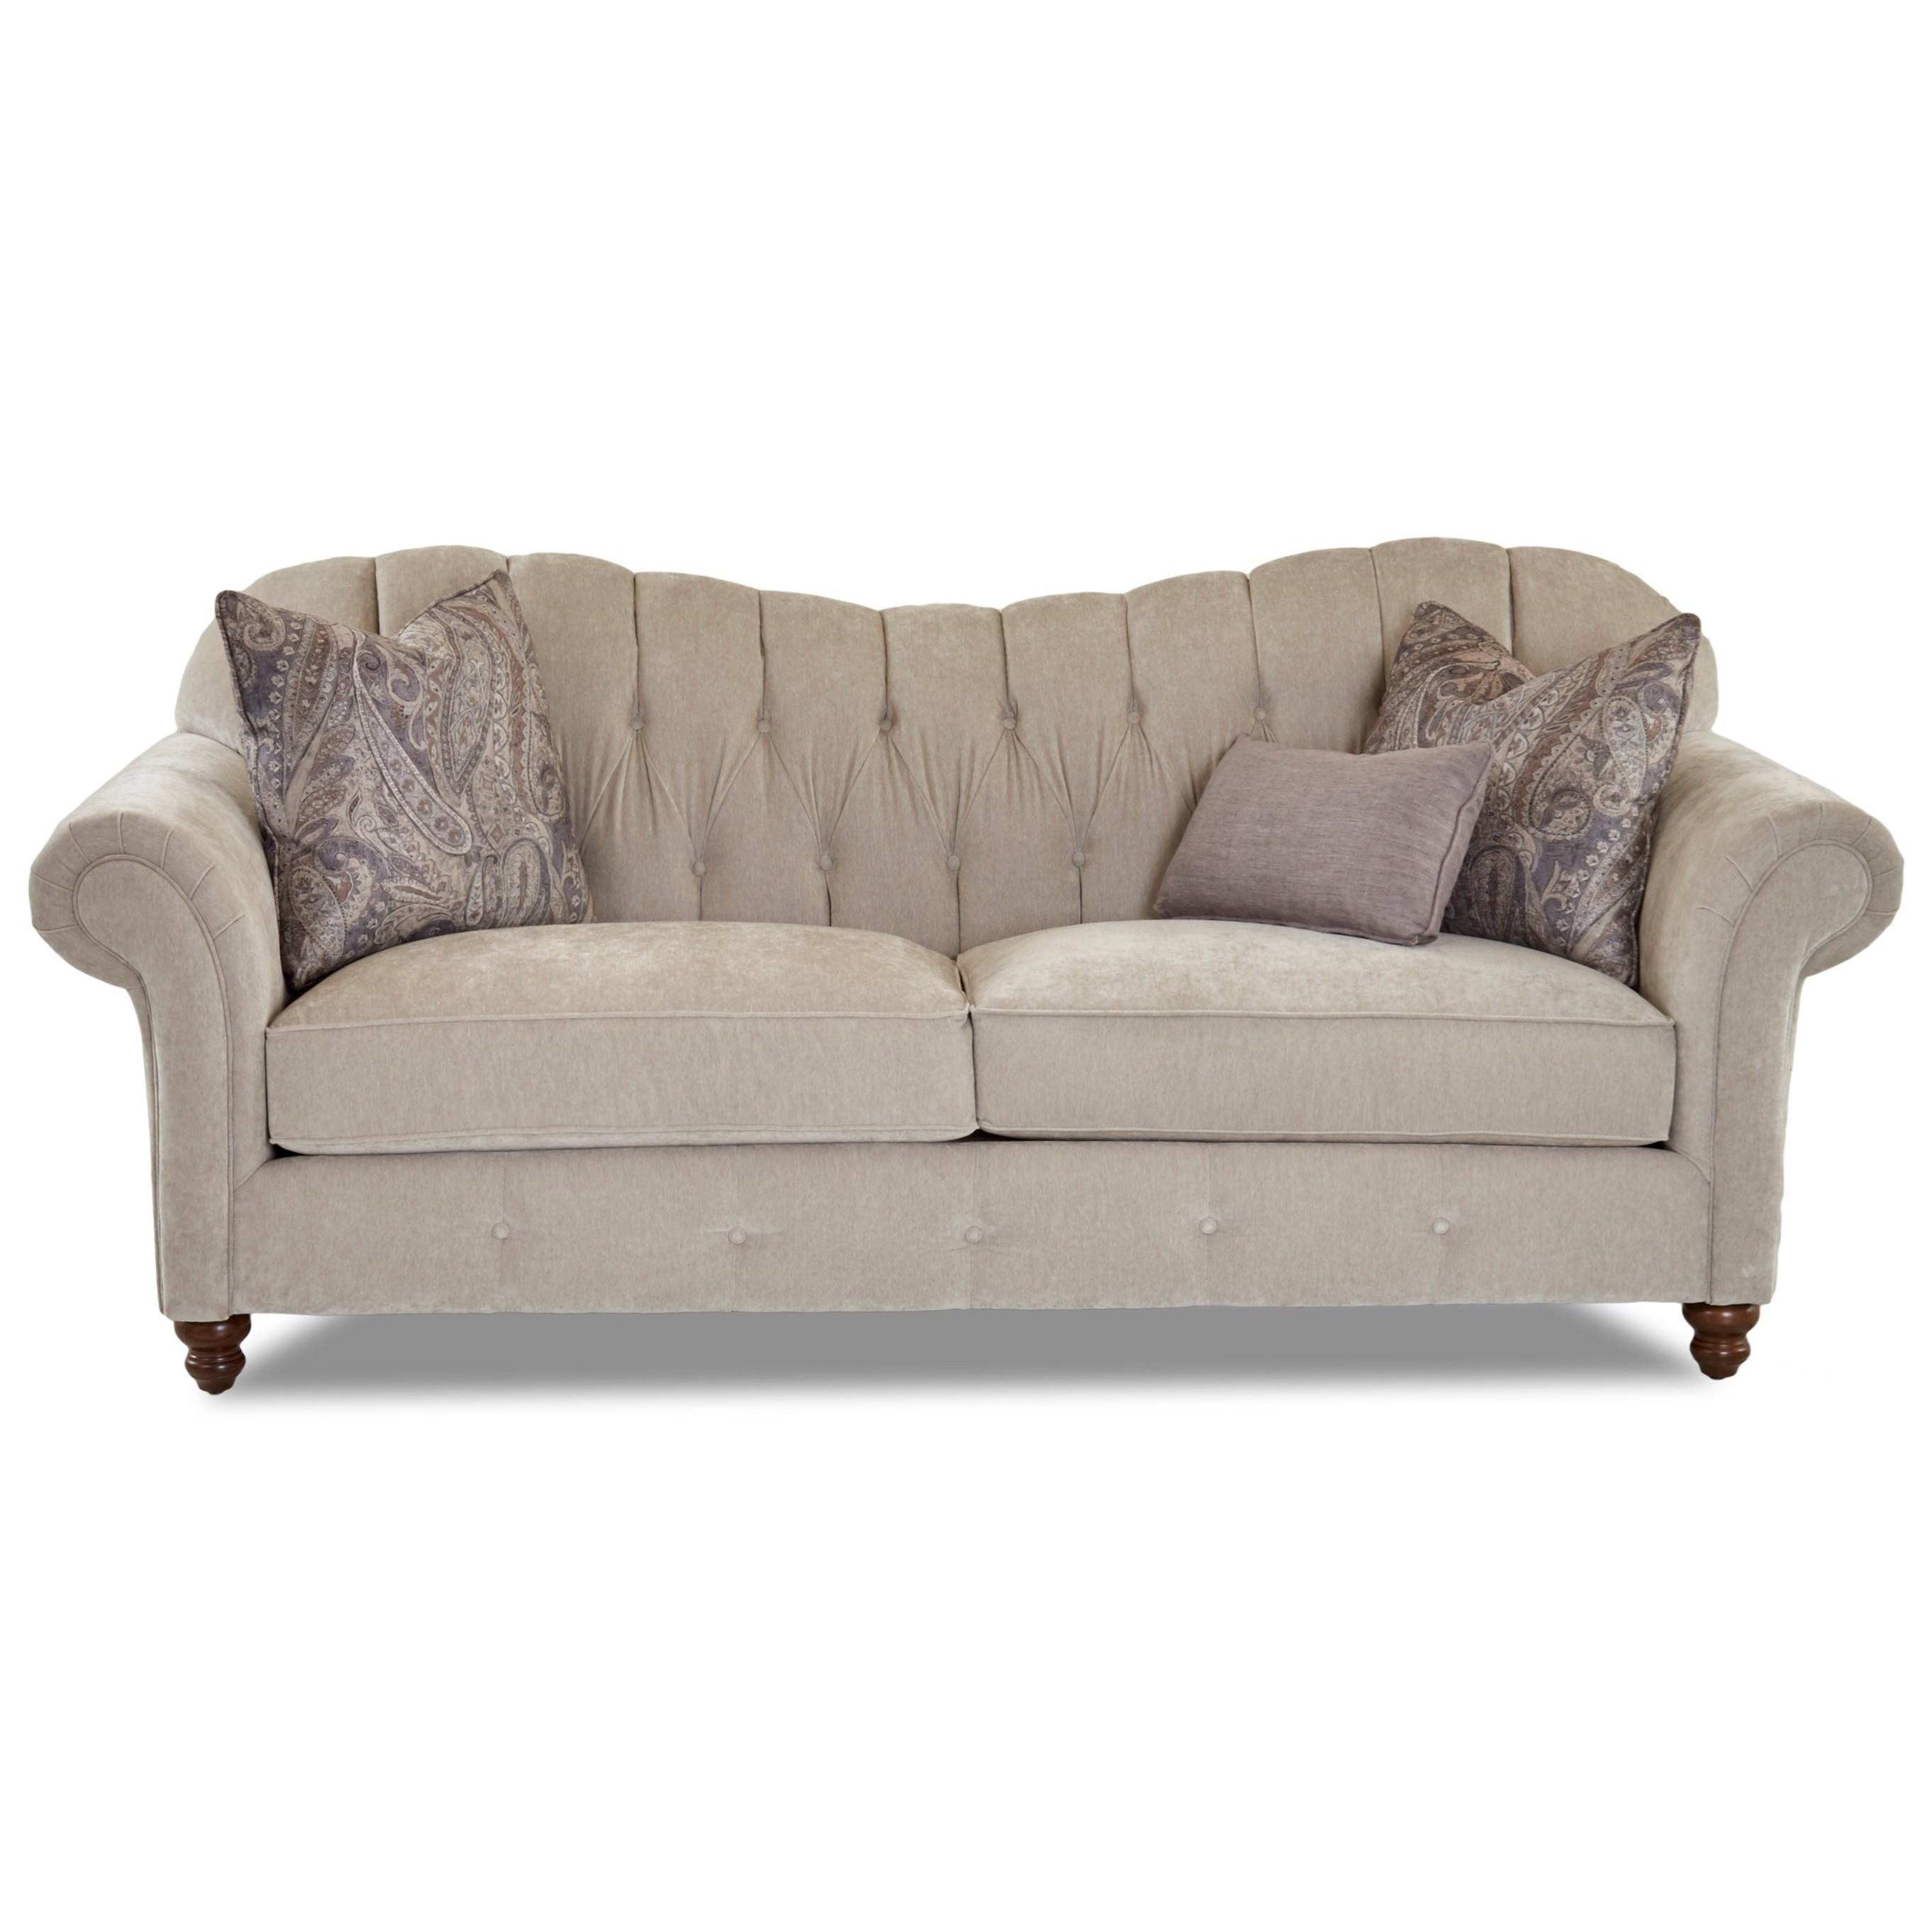 Sofa (no nails)